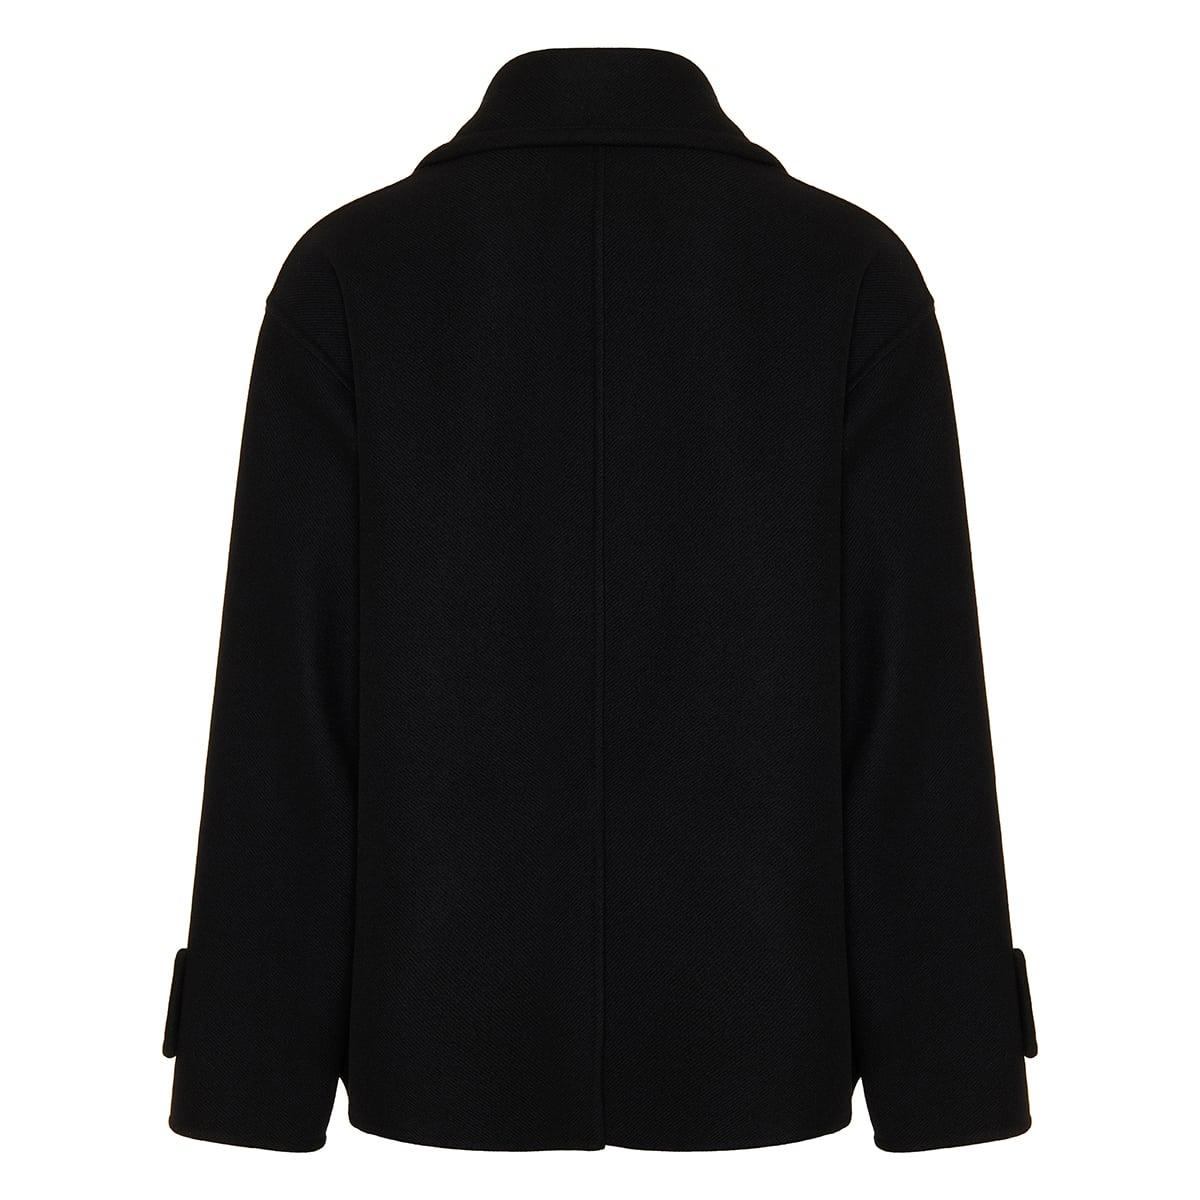 Oversized short wool pea coat